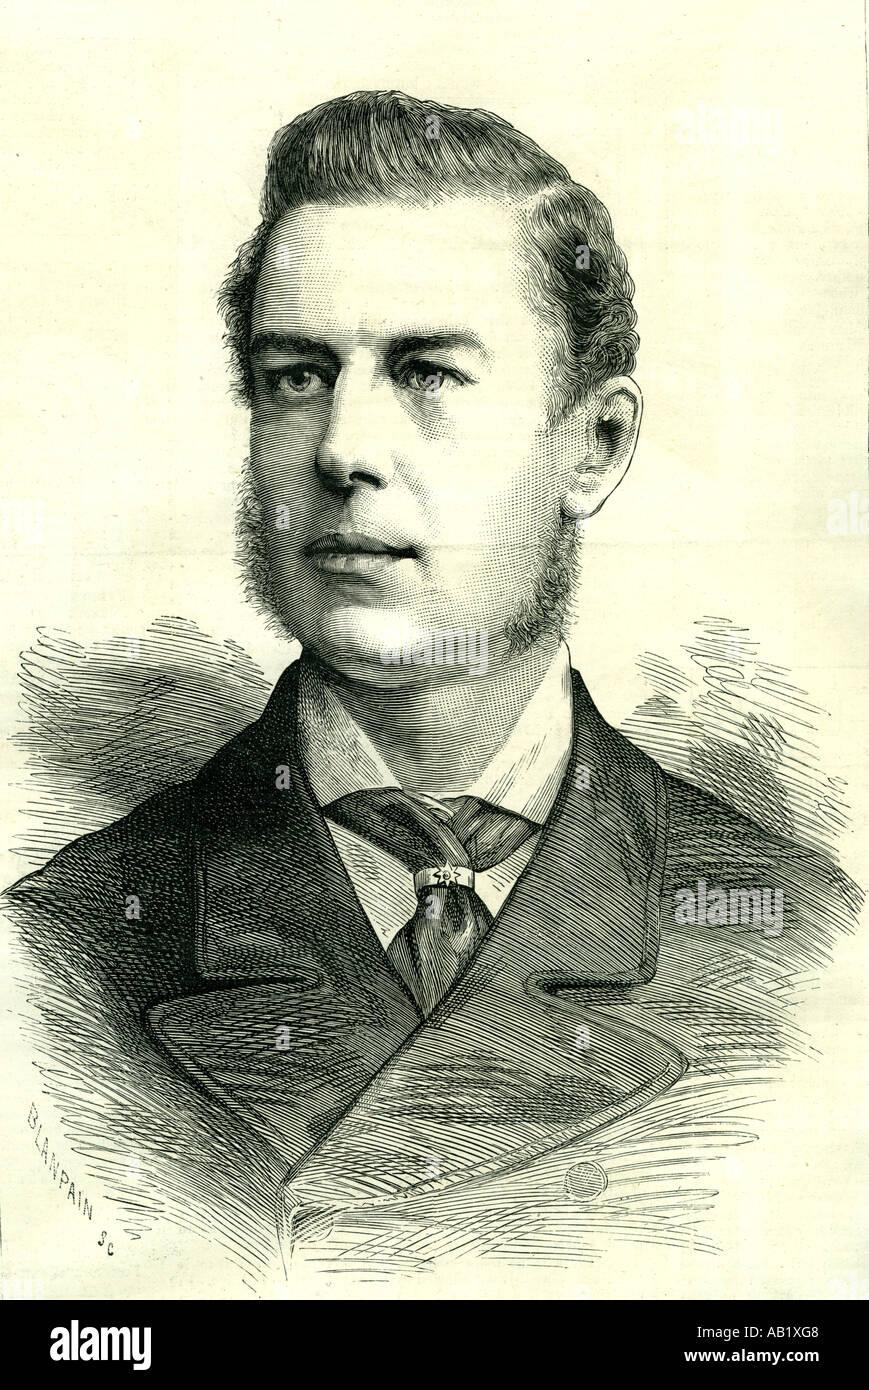 Joseph Chamberlain 1885 U K estadista liberal attracking mucha atención nacido 1836 Imagen De Stock